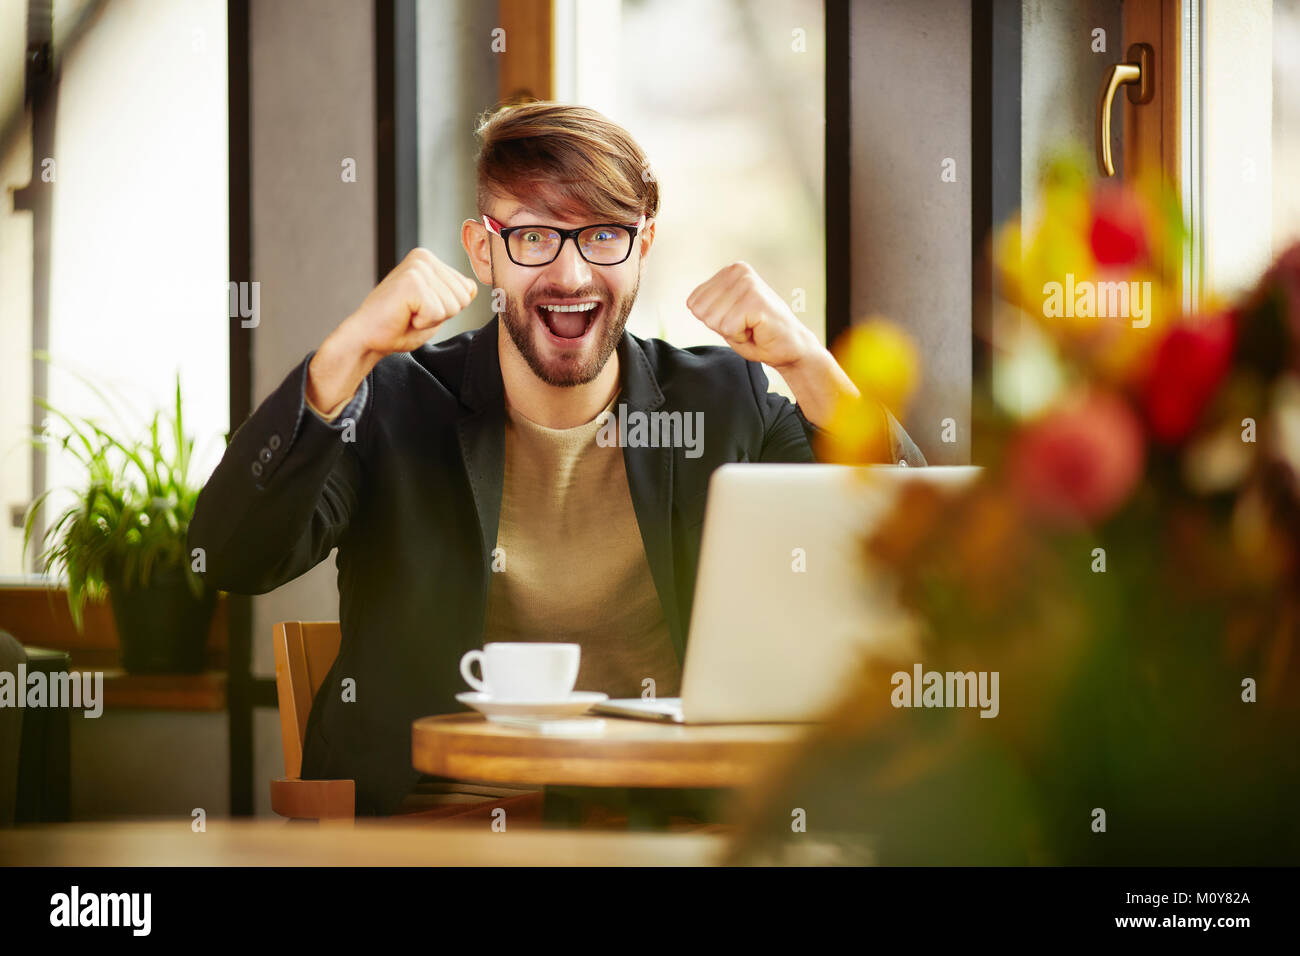 Hombre emocional celebrando en portátil Imagen De Stock